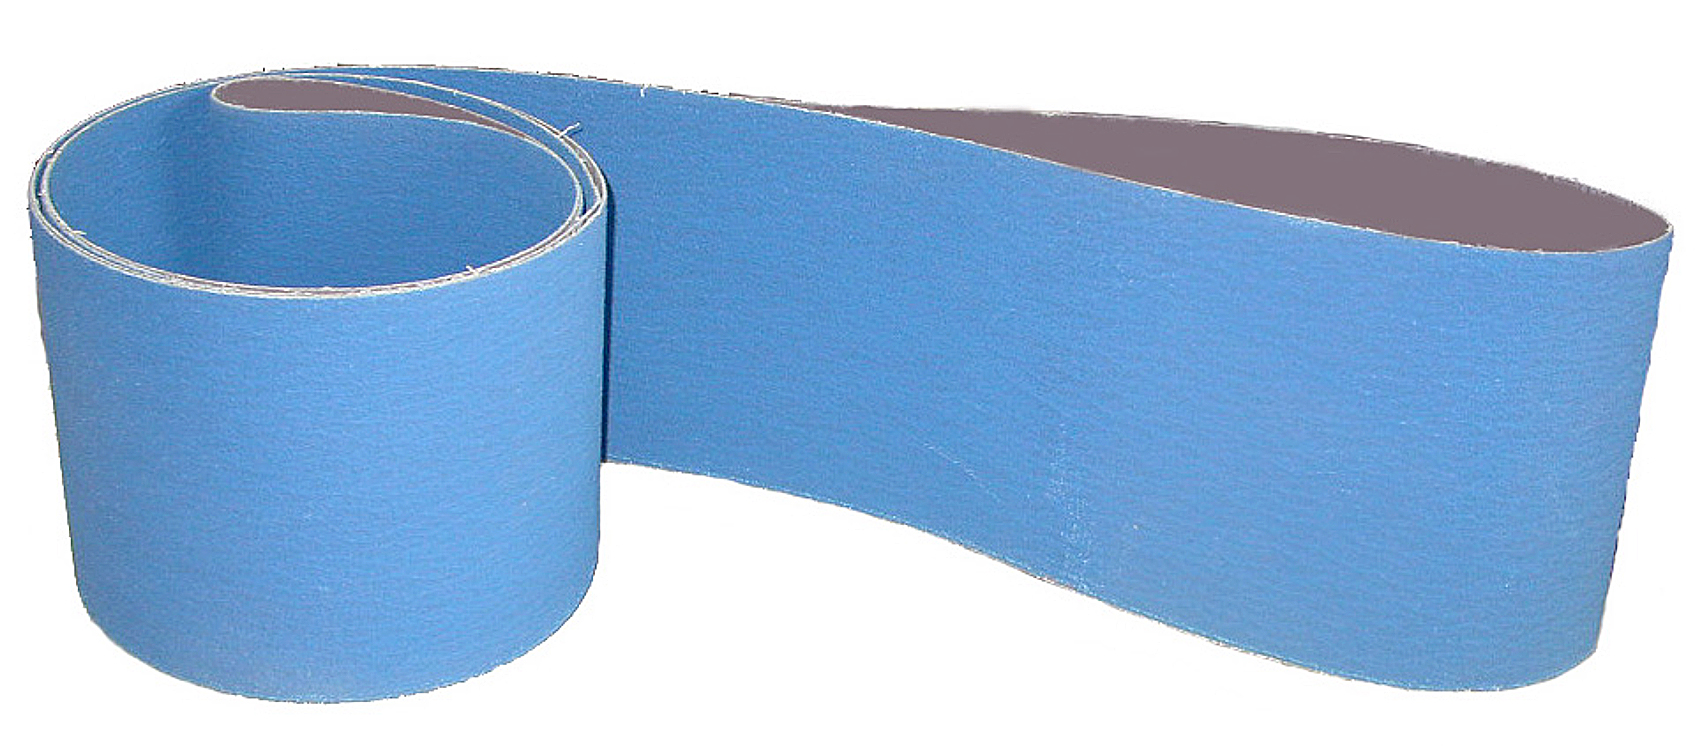 Zirkonschleifband 100 x 1000 mm K 36